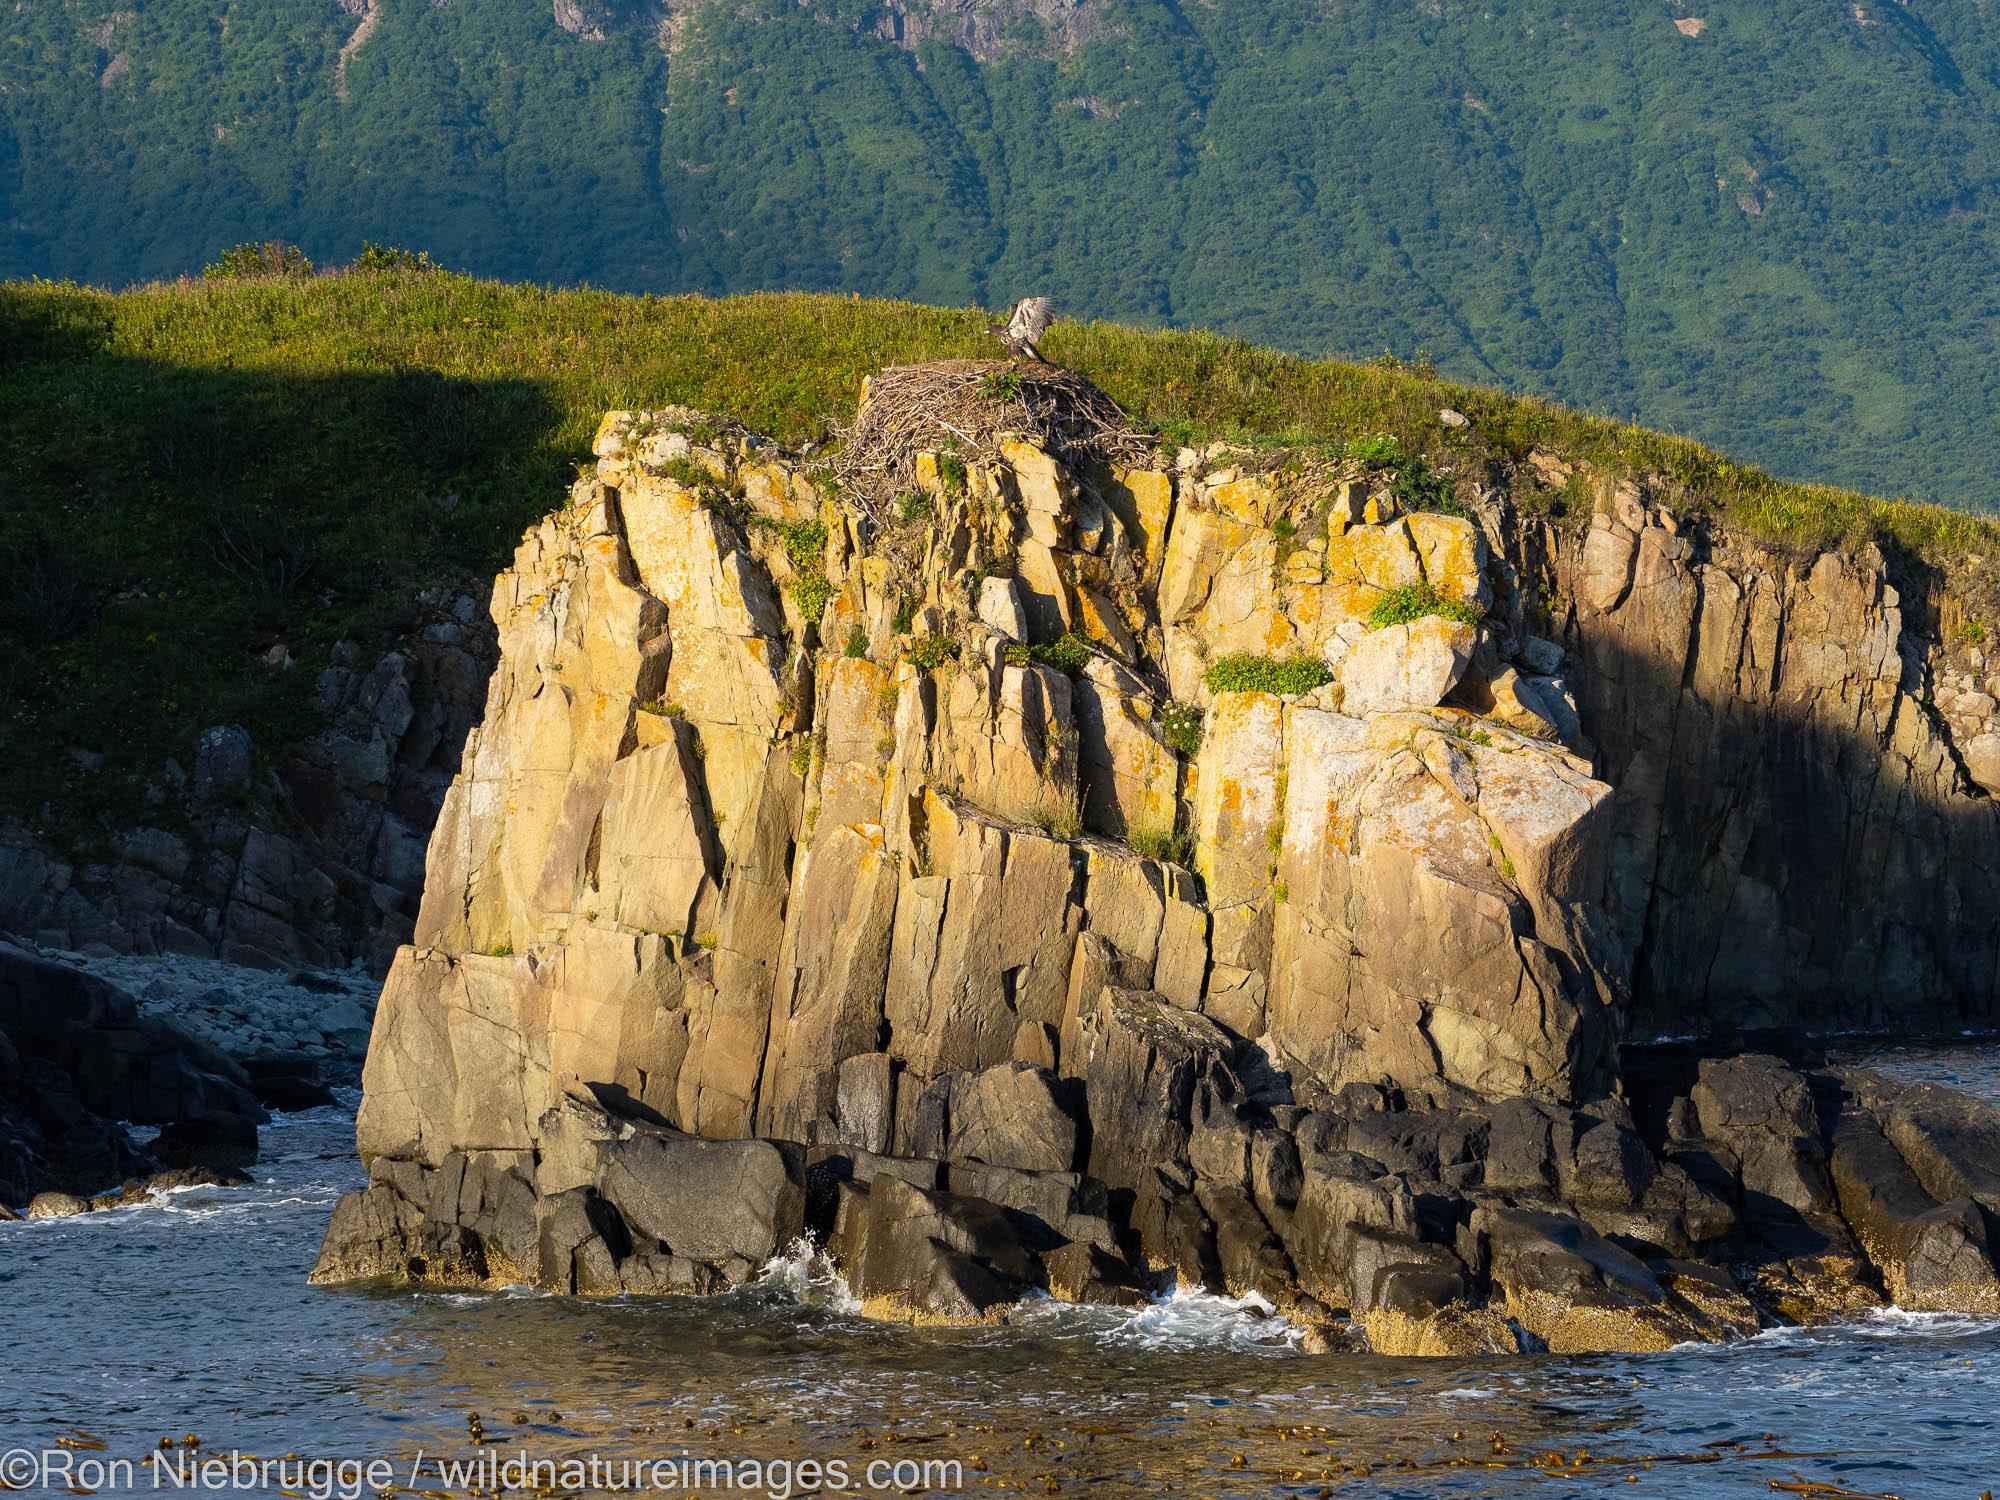 Bald Eagle nest, Katmai National Park, Alaska.